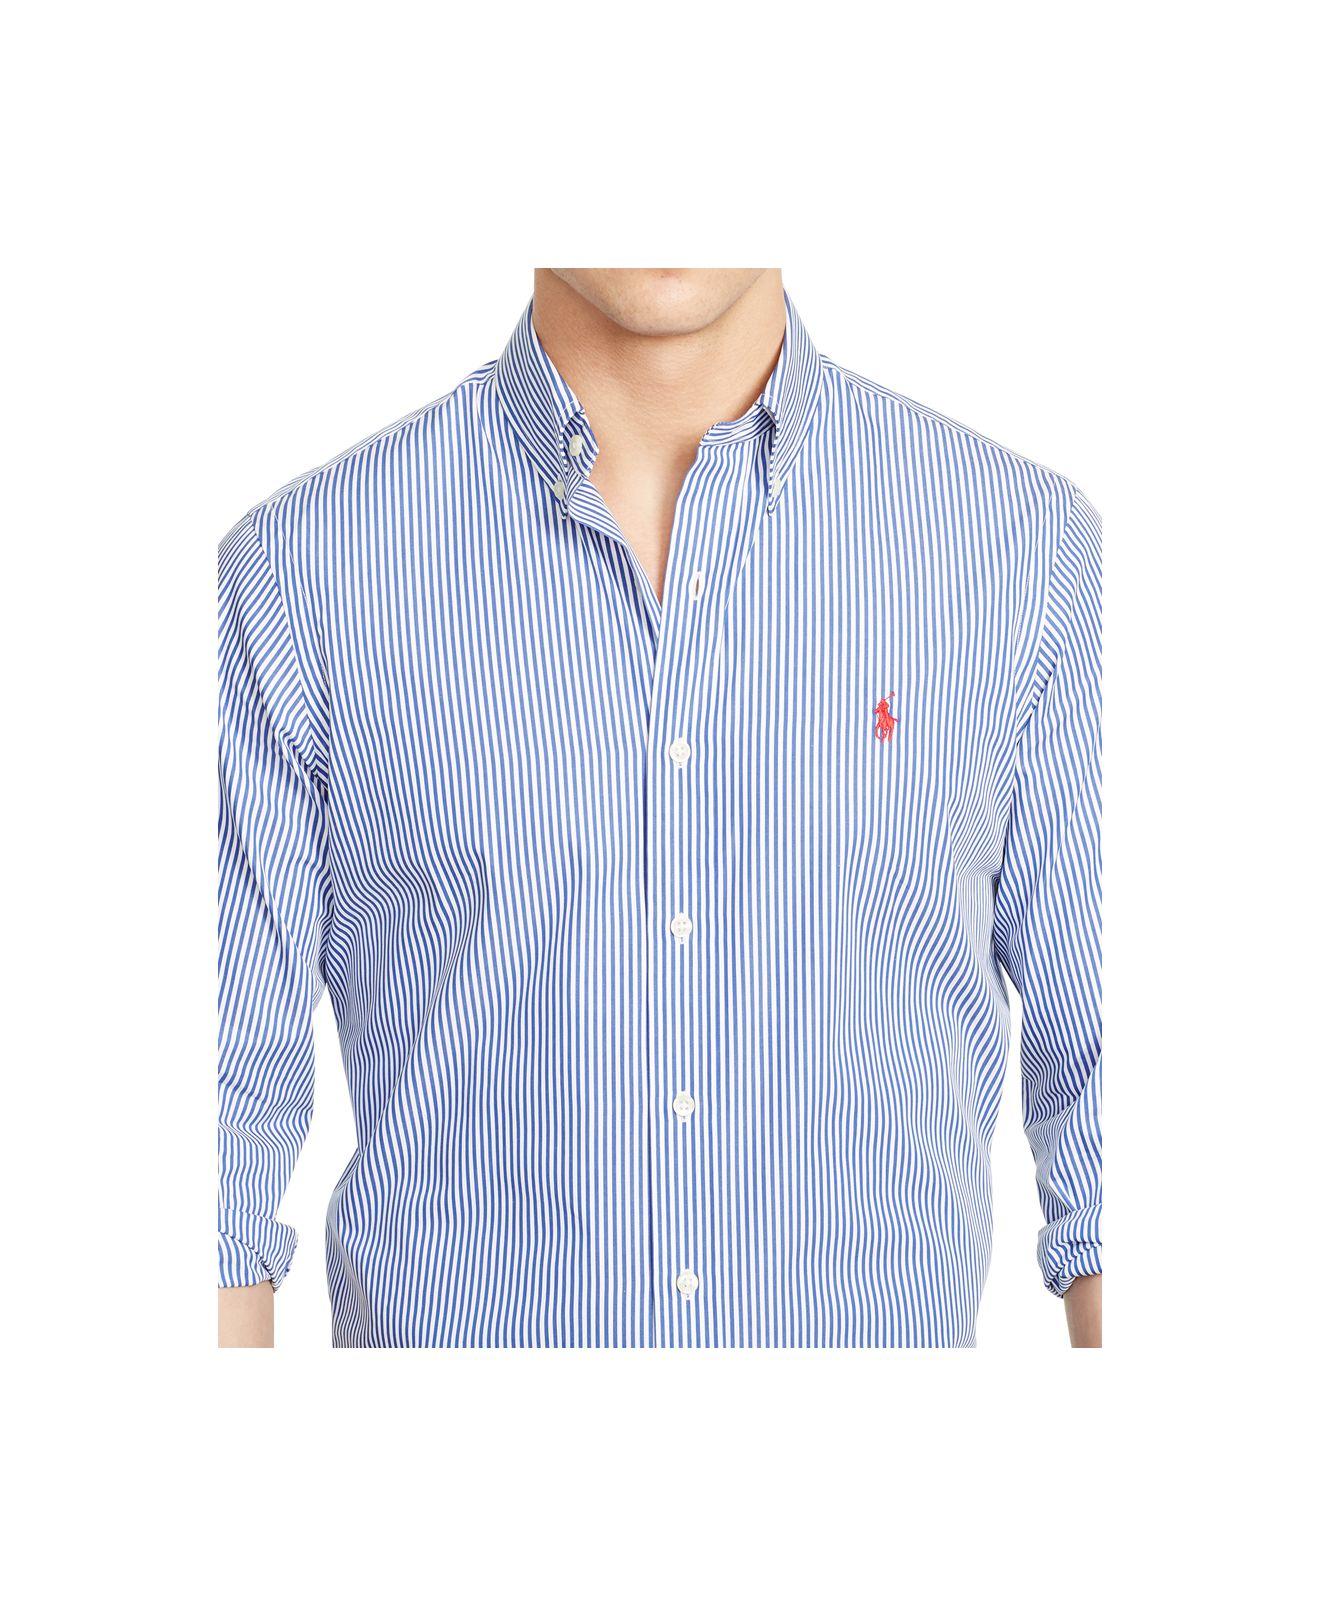 38d600c161184 ... norway lyst polo ralph lauren slim fit striped poplin shirt in blue for  men bbb77 17687